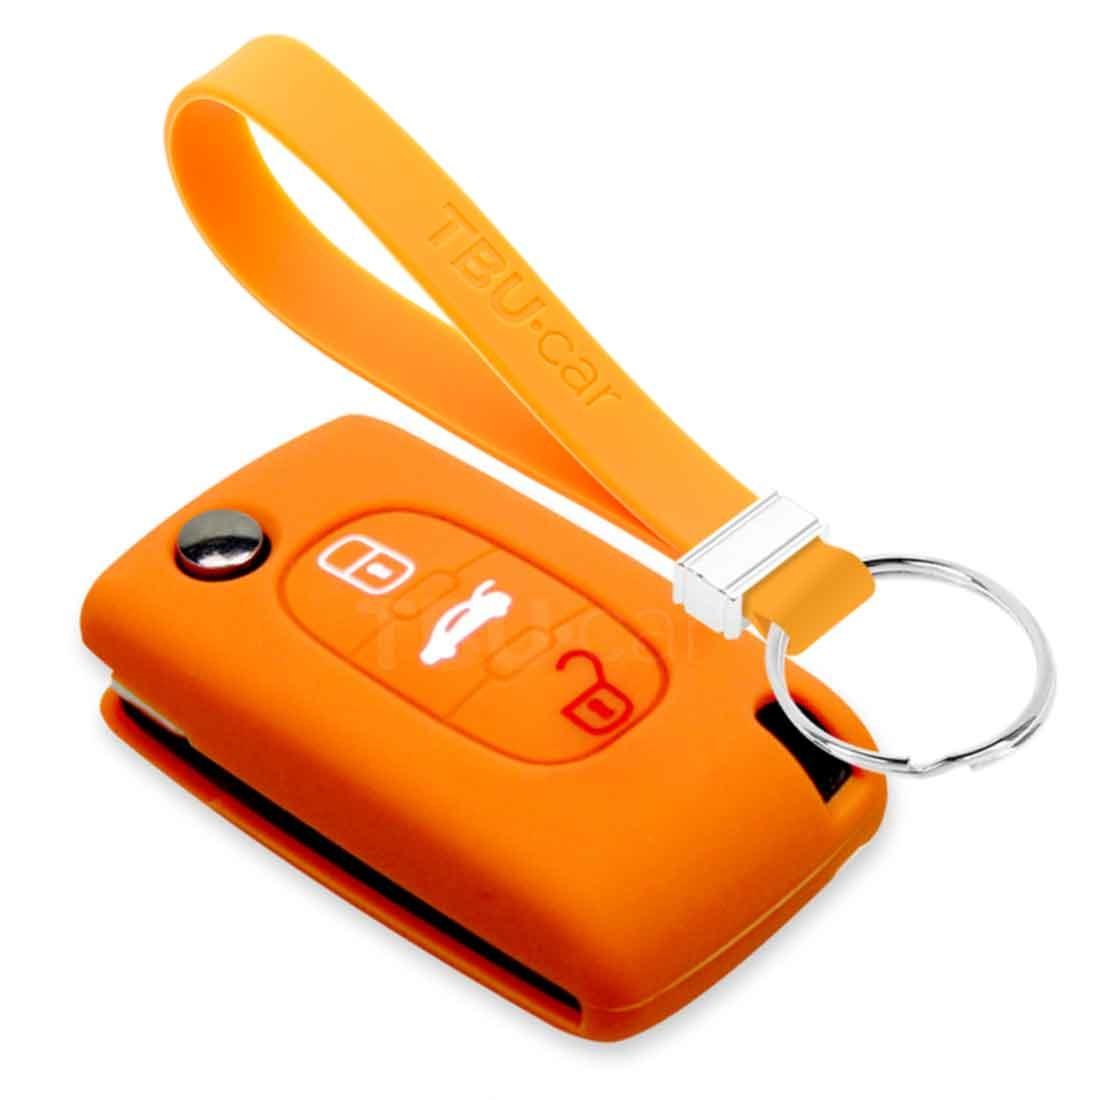 TBU car TBU car Autoschlüssel Hülle kompatibel mit Peugeot 3 Tasten - Schutzhülle aus Silikon - Auto Schlüsselhülle Cover in Orange